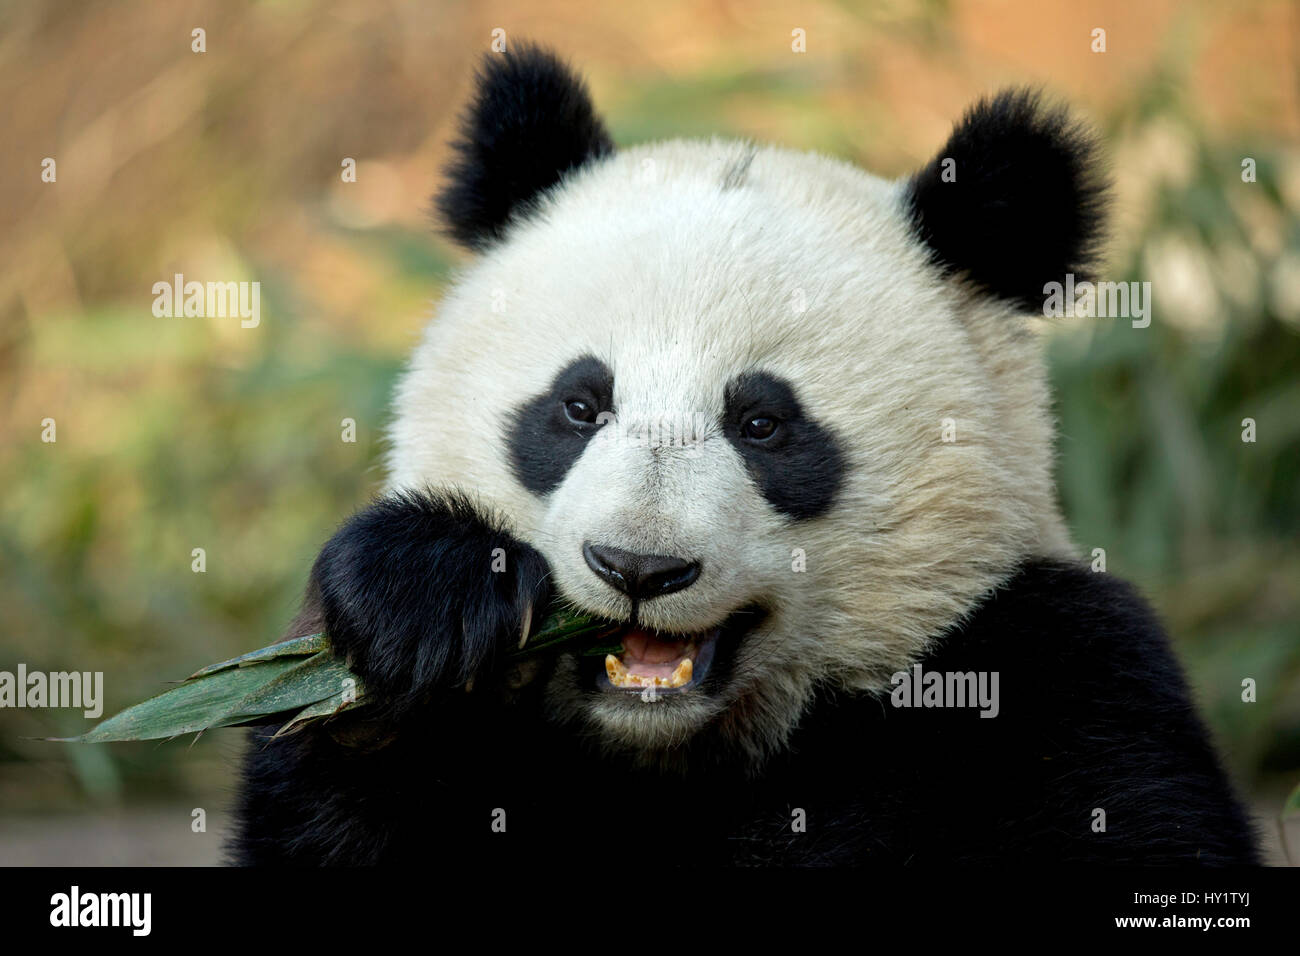 Großer Panda (Ailuropoda Melanoleuca) sub-adult füttern. Bifengxia, China. In Gefangenschaft. Stockfoto